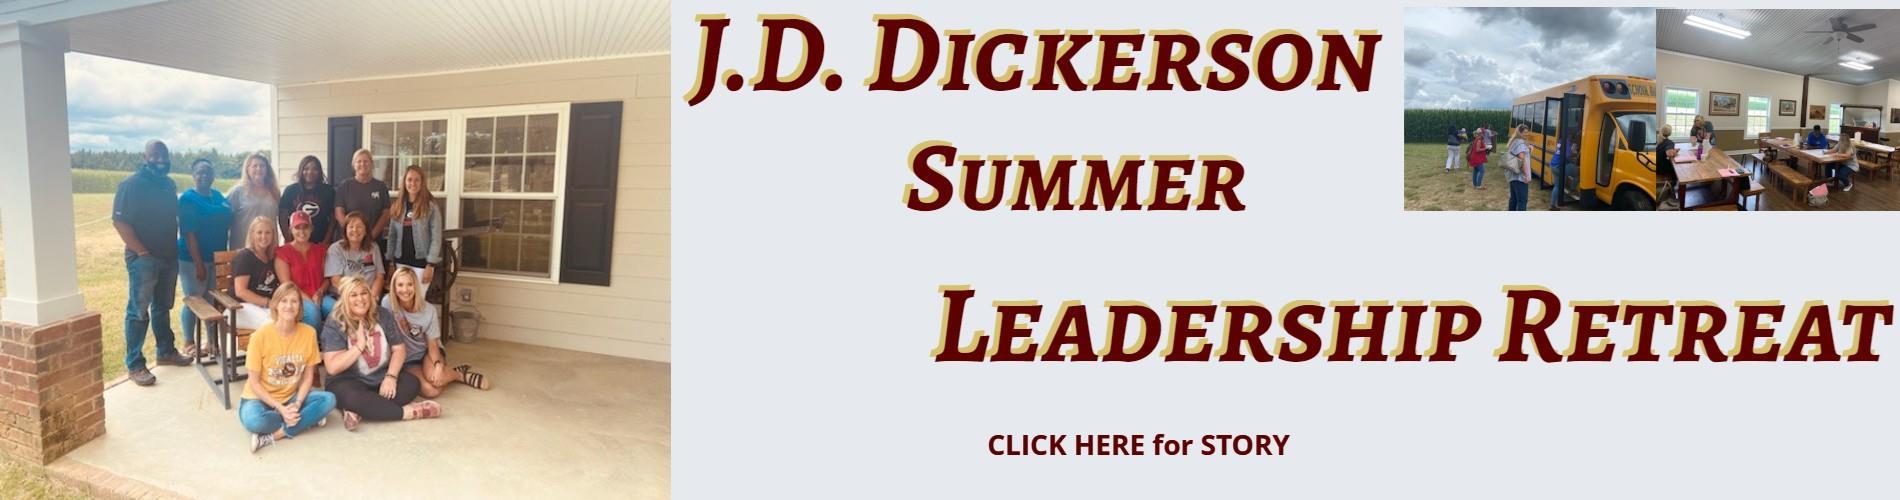 JDD Leadership Retreat